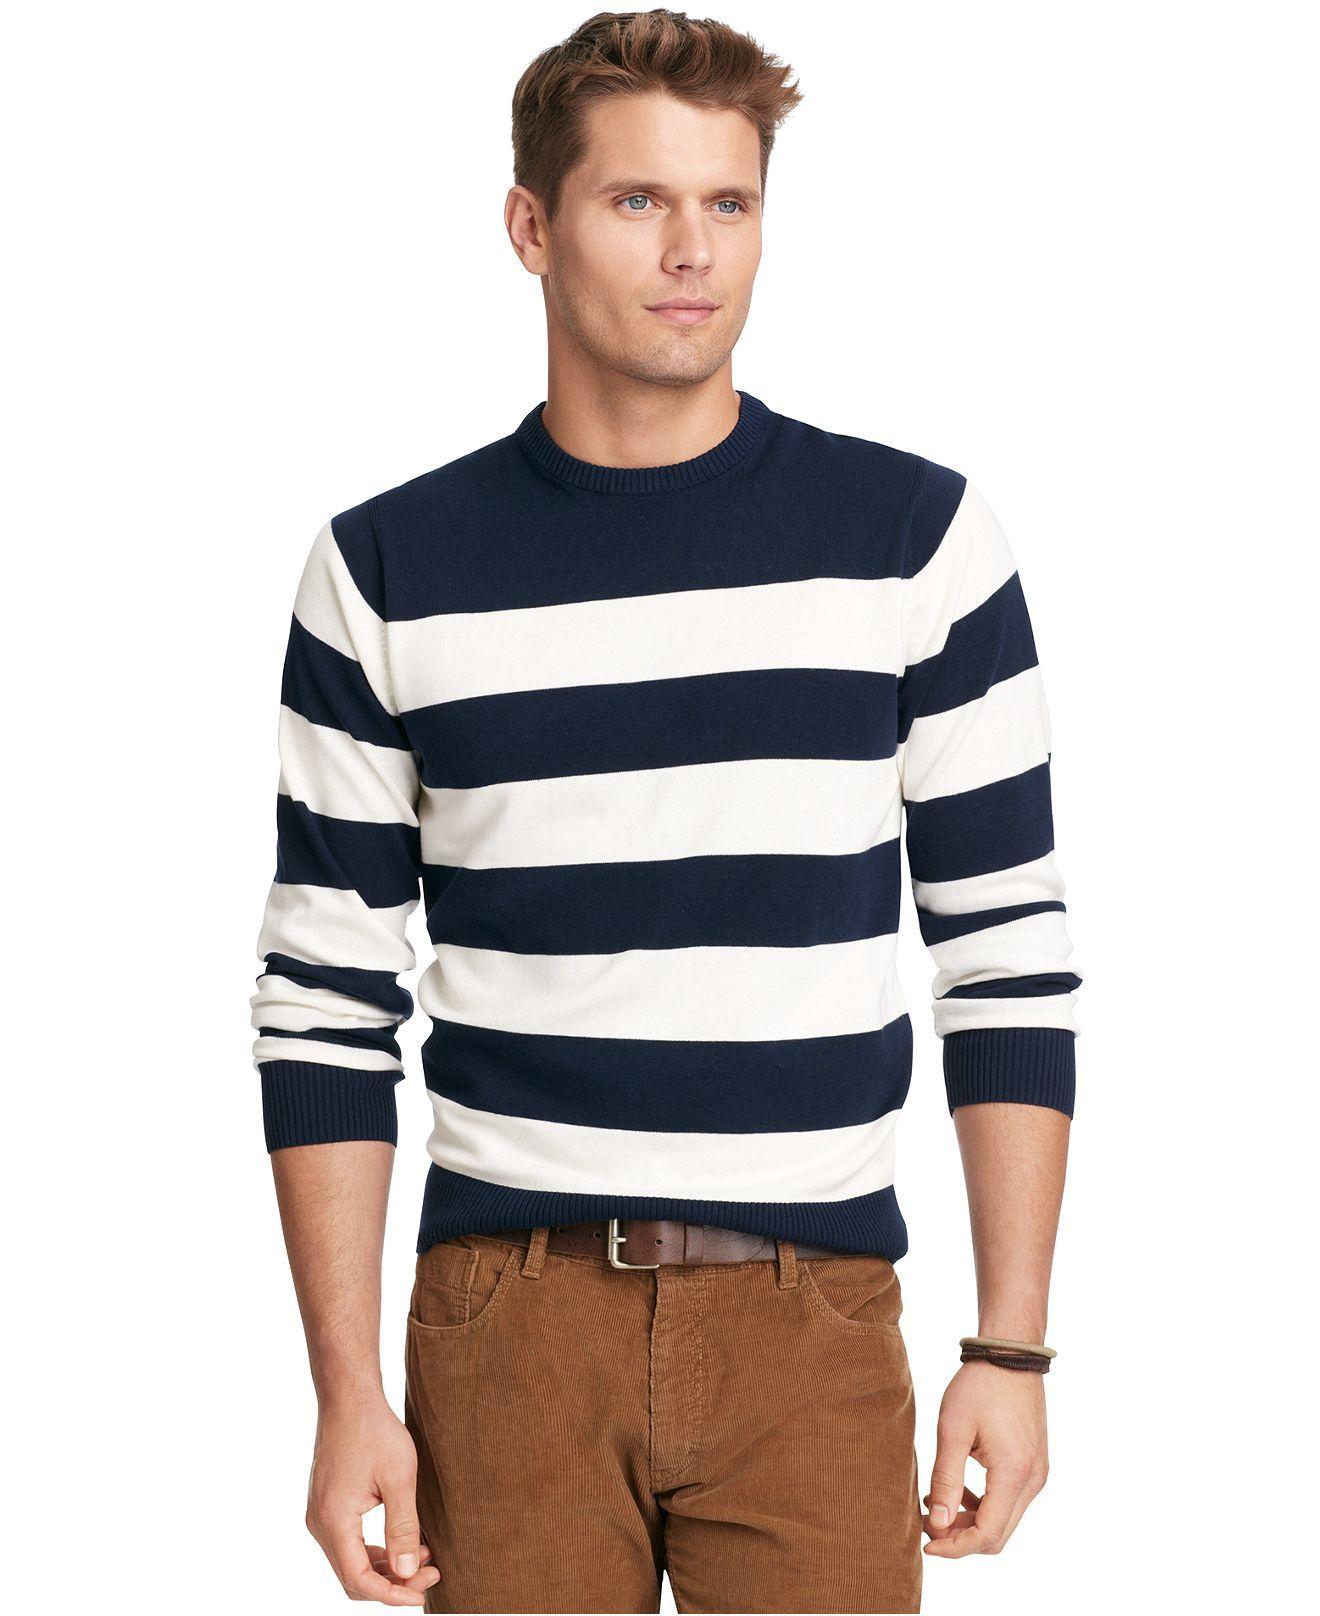 Izod Sweater, Crew Neck Stripe Fine Gauge Lightweight Sweater - Sweaters - Men - Macy's